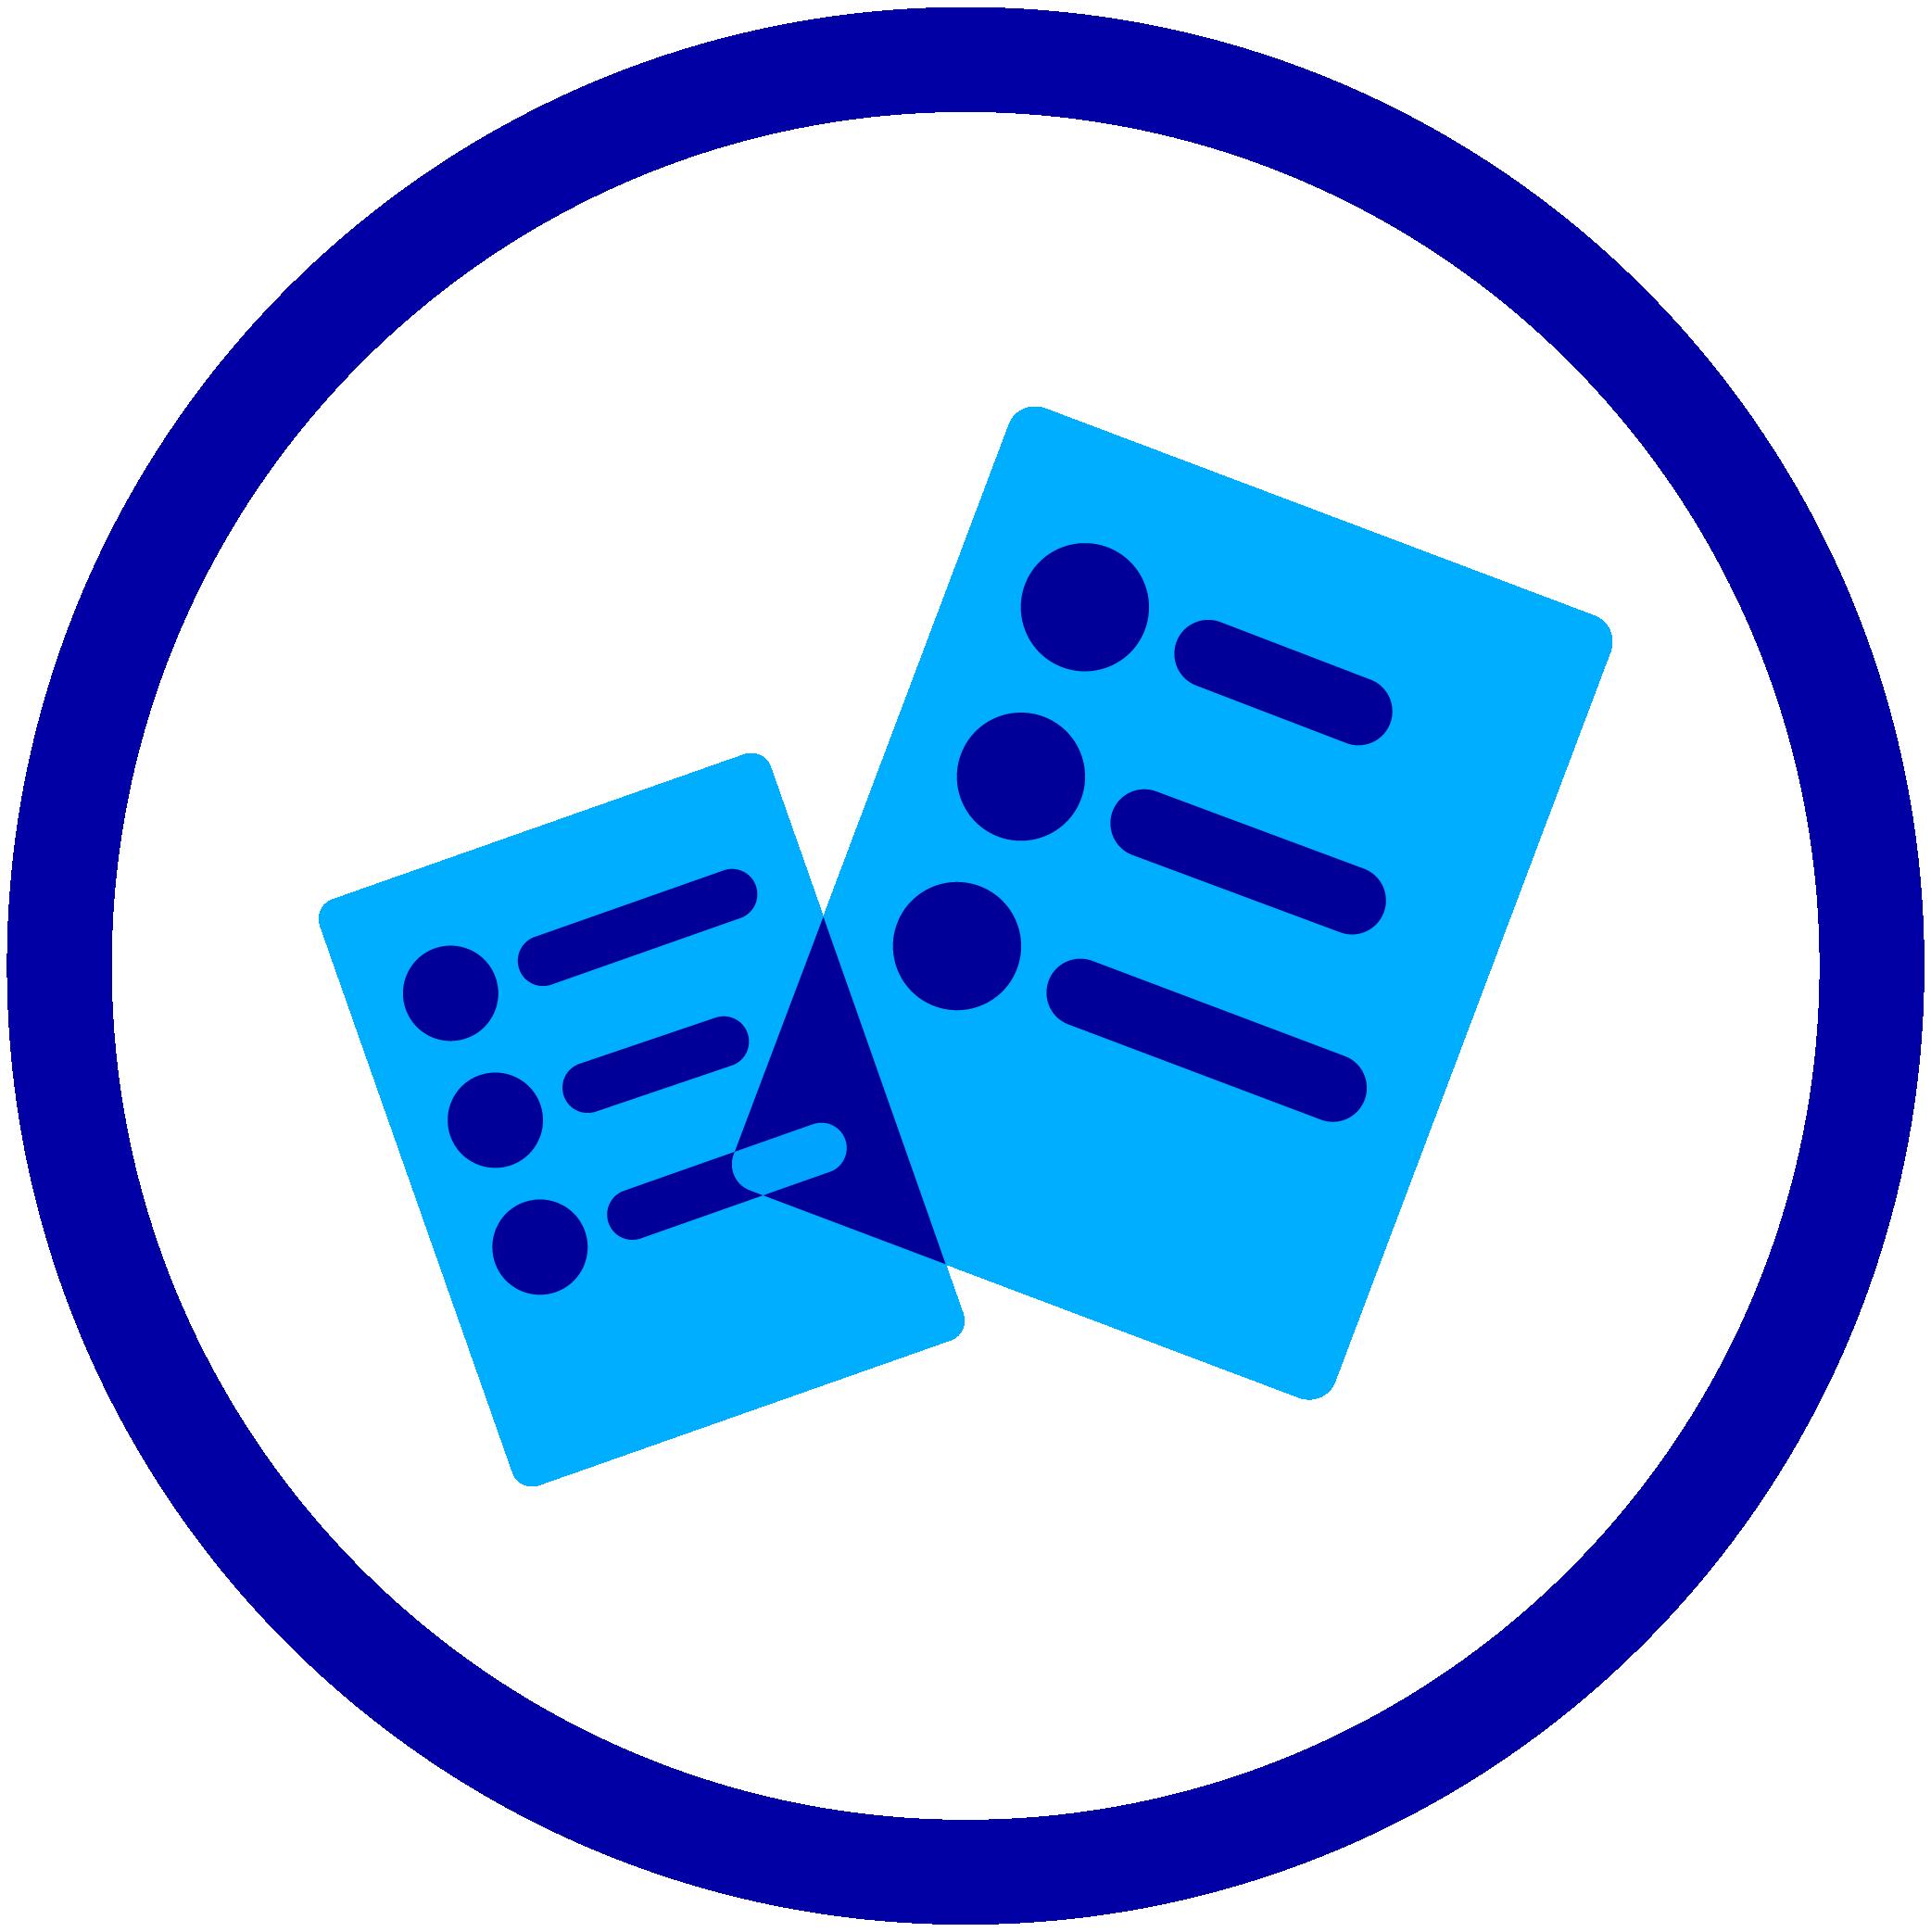 https://it.fi-group.com/wp-content/uploads/sites/10/2021/09/blue-icons-set_1-07.png